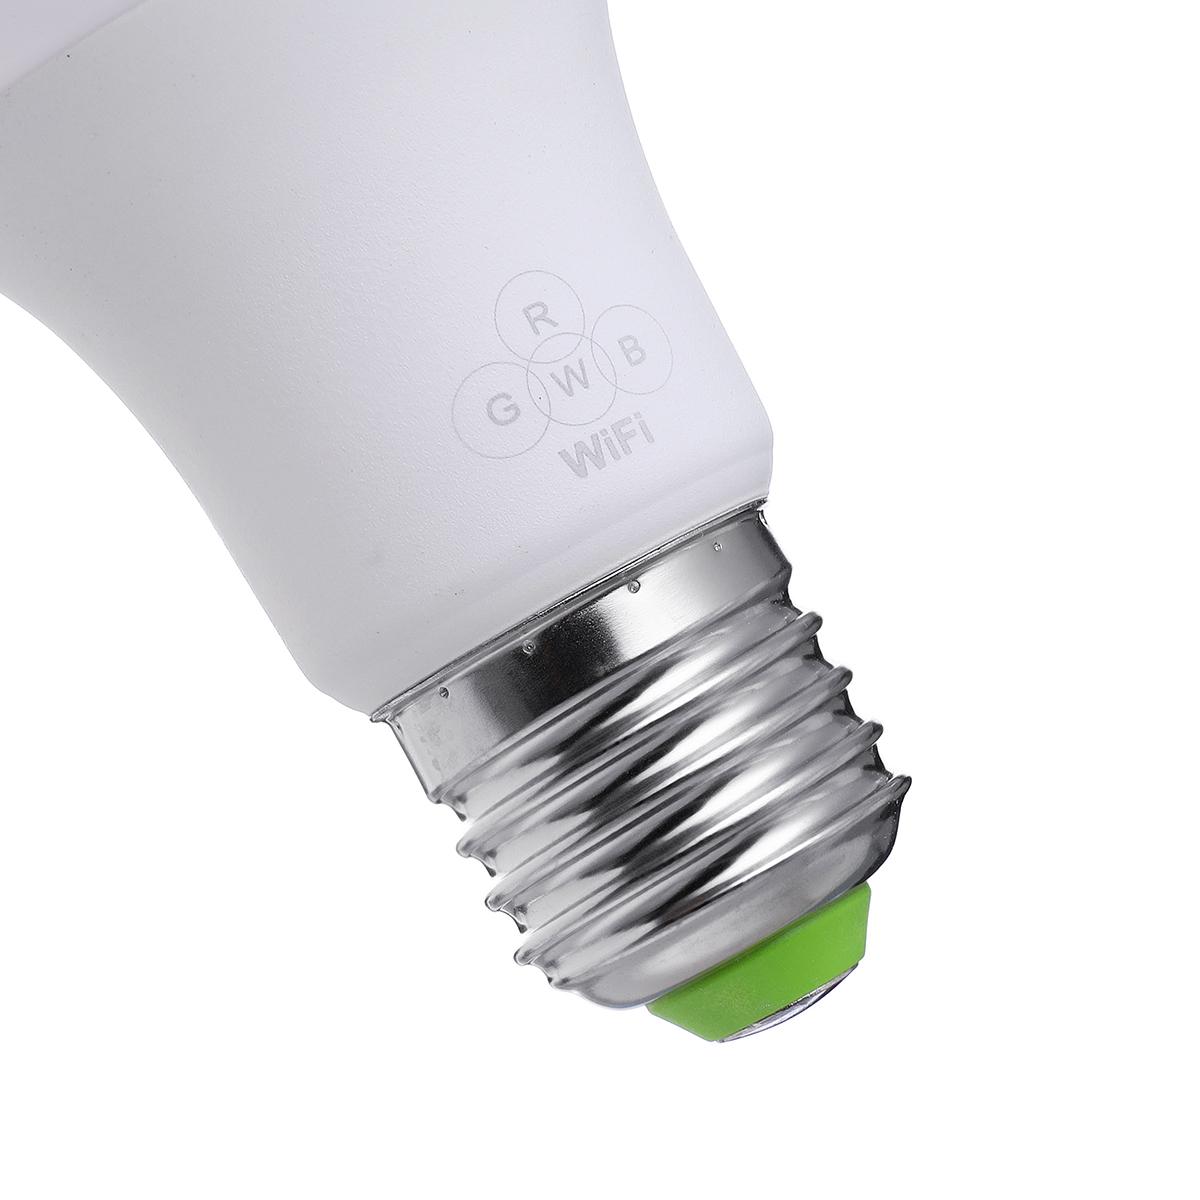 AC100-240V 4.5W E27 RGB WIFI Smart LED Light Bulb Remote Voice Control Lamp Work With Amazon Alexa Google Home